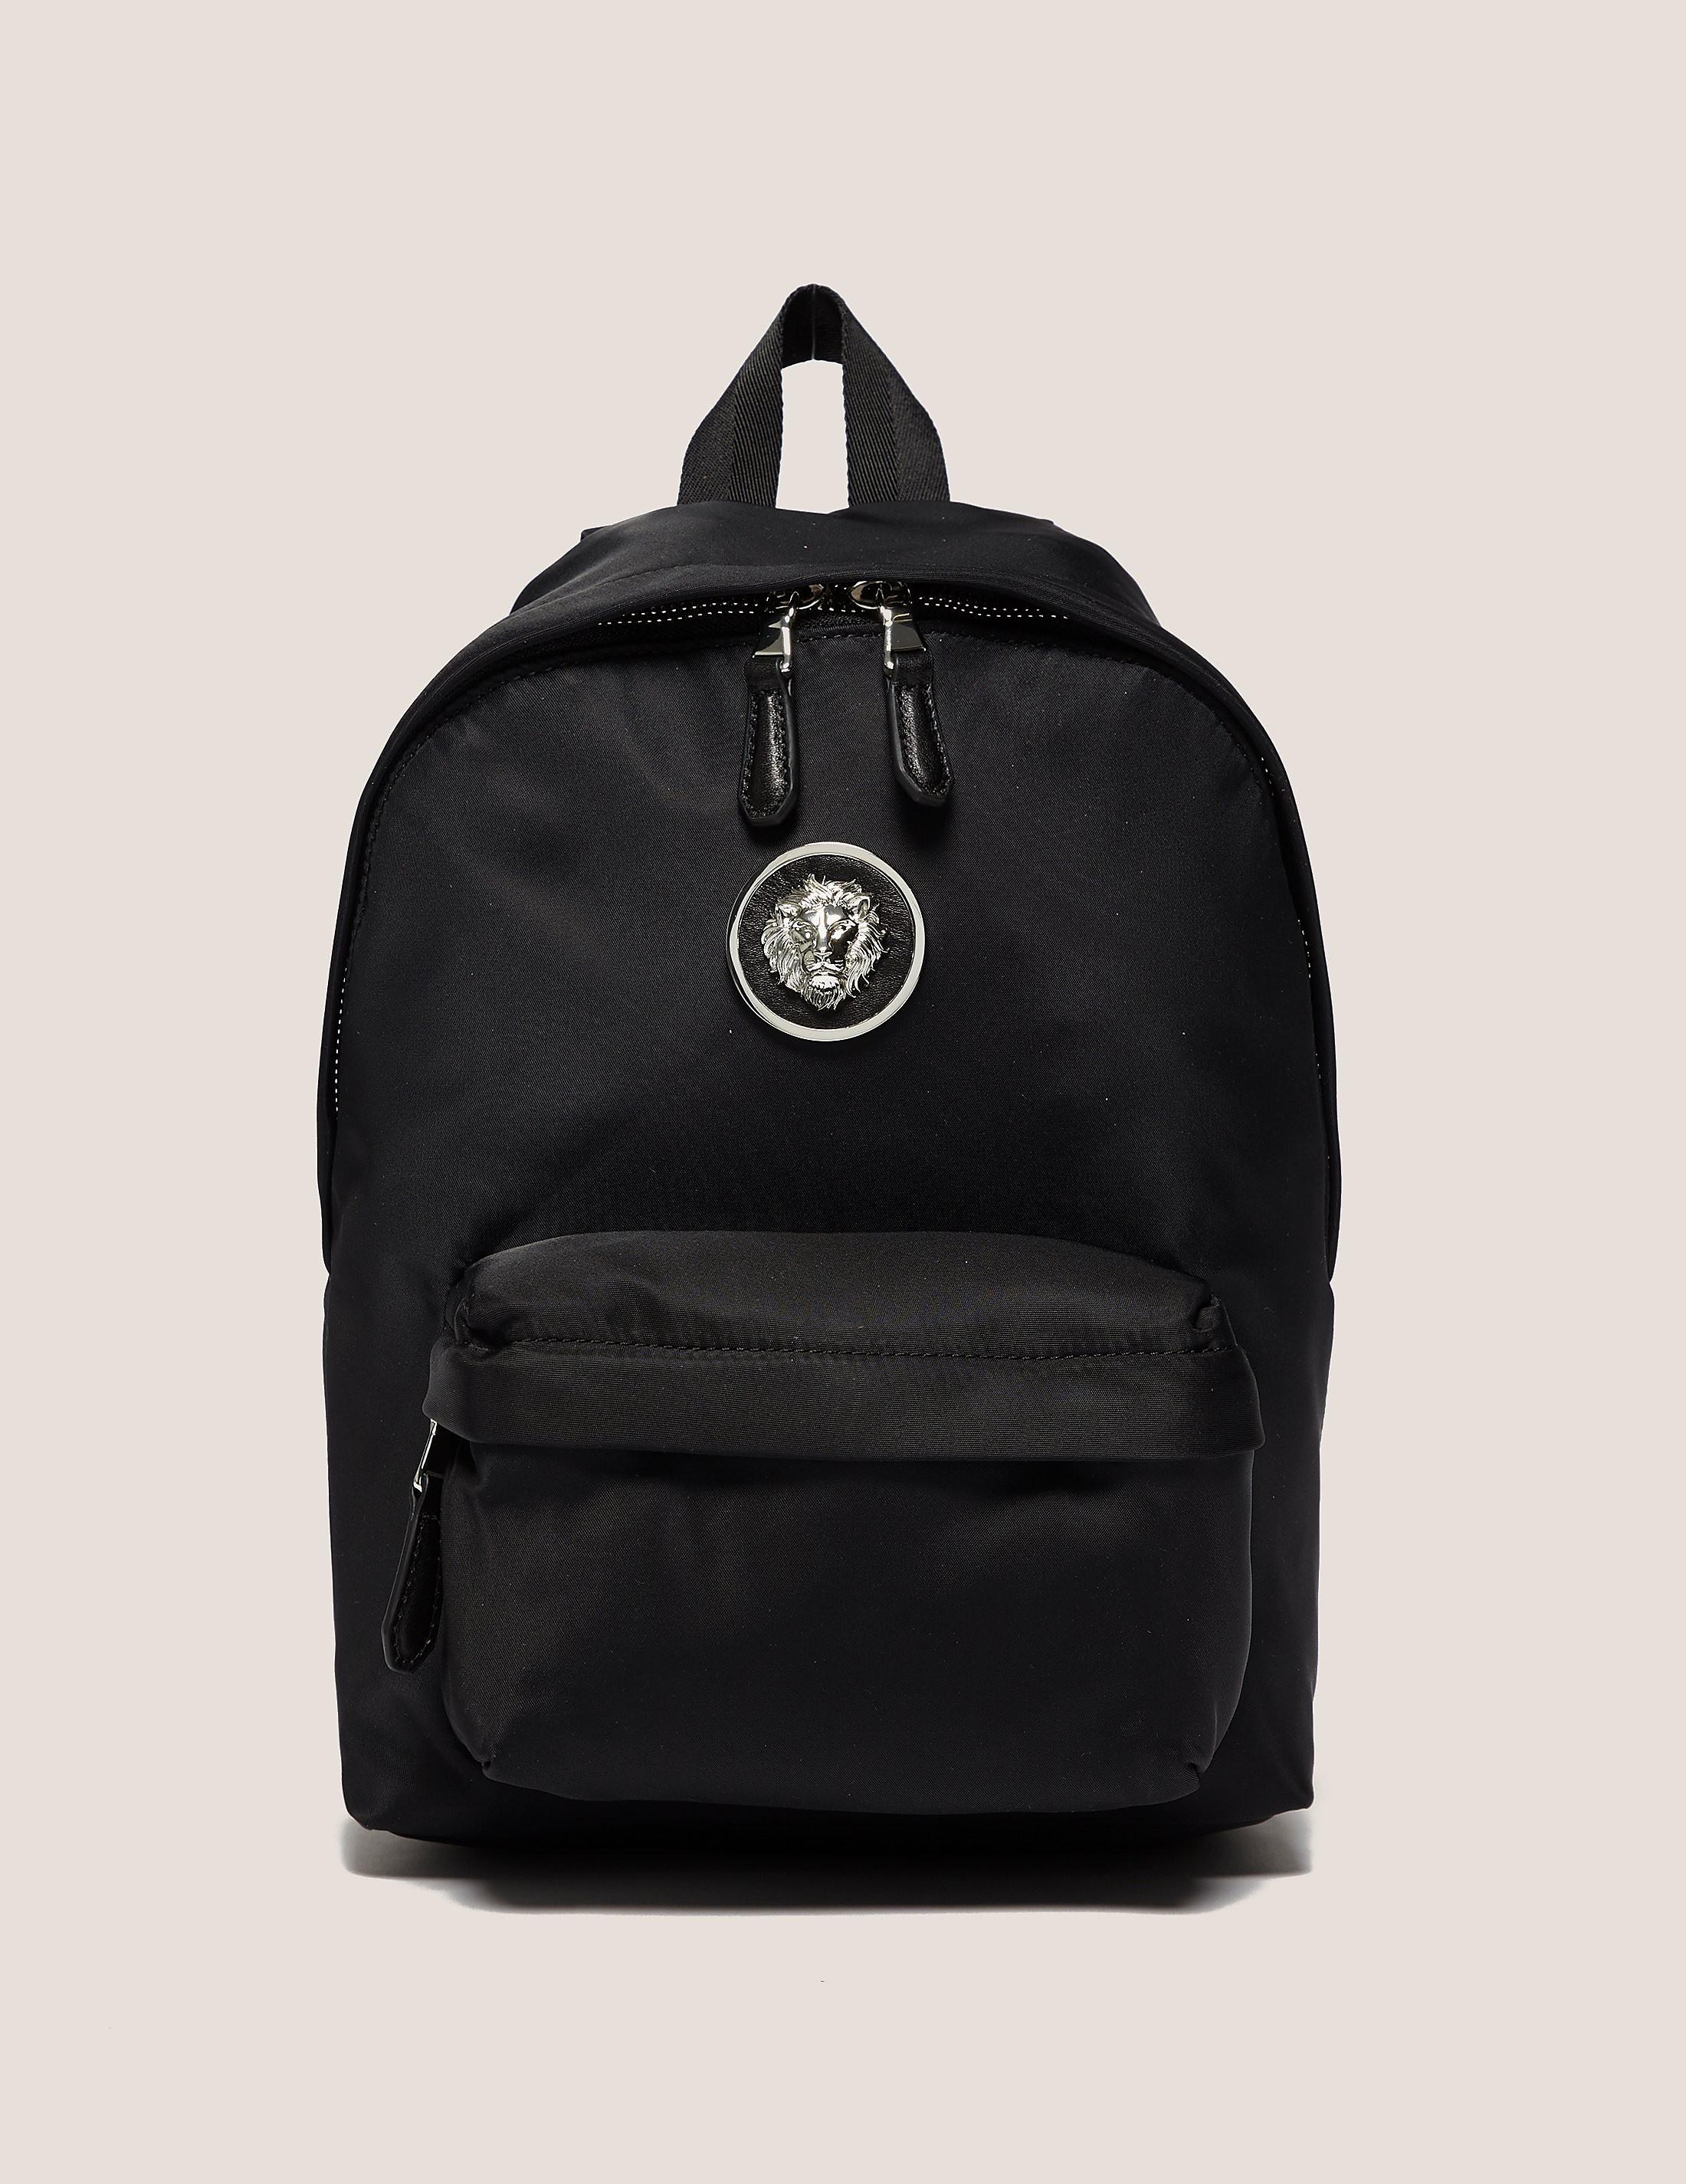 Versus Versace Lion Head Backpack